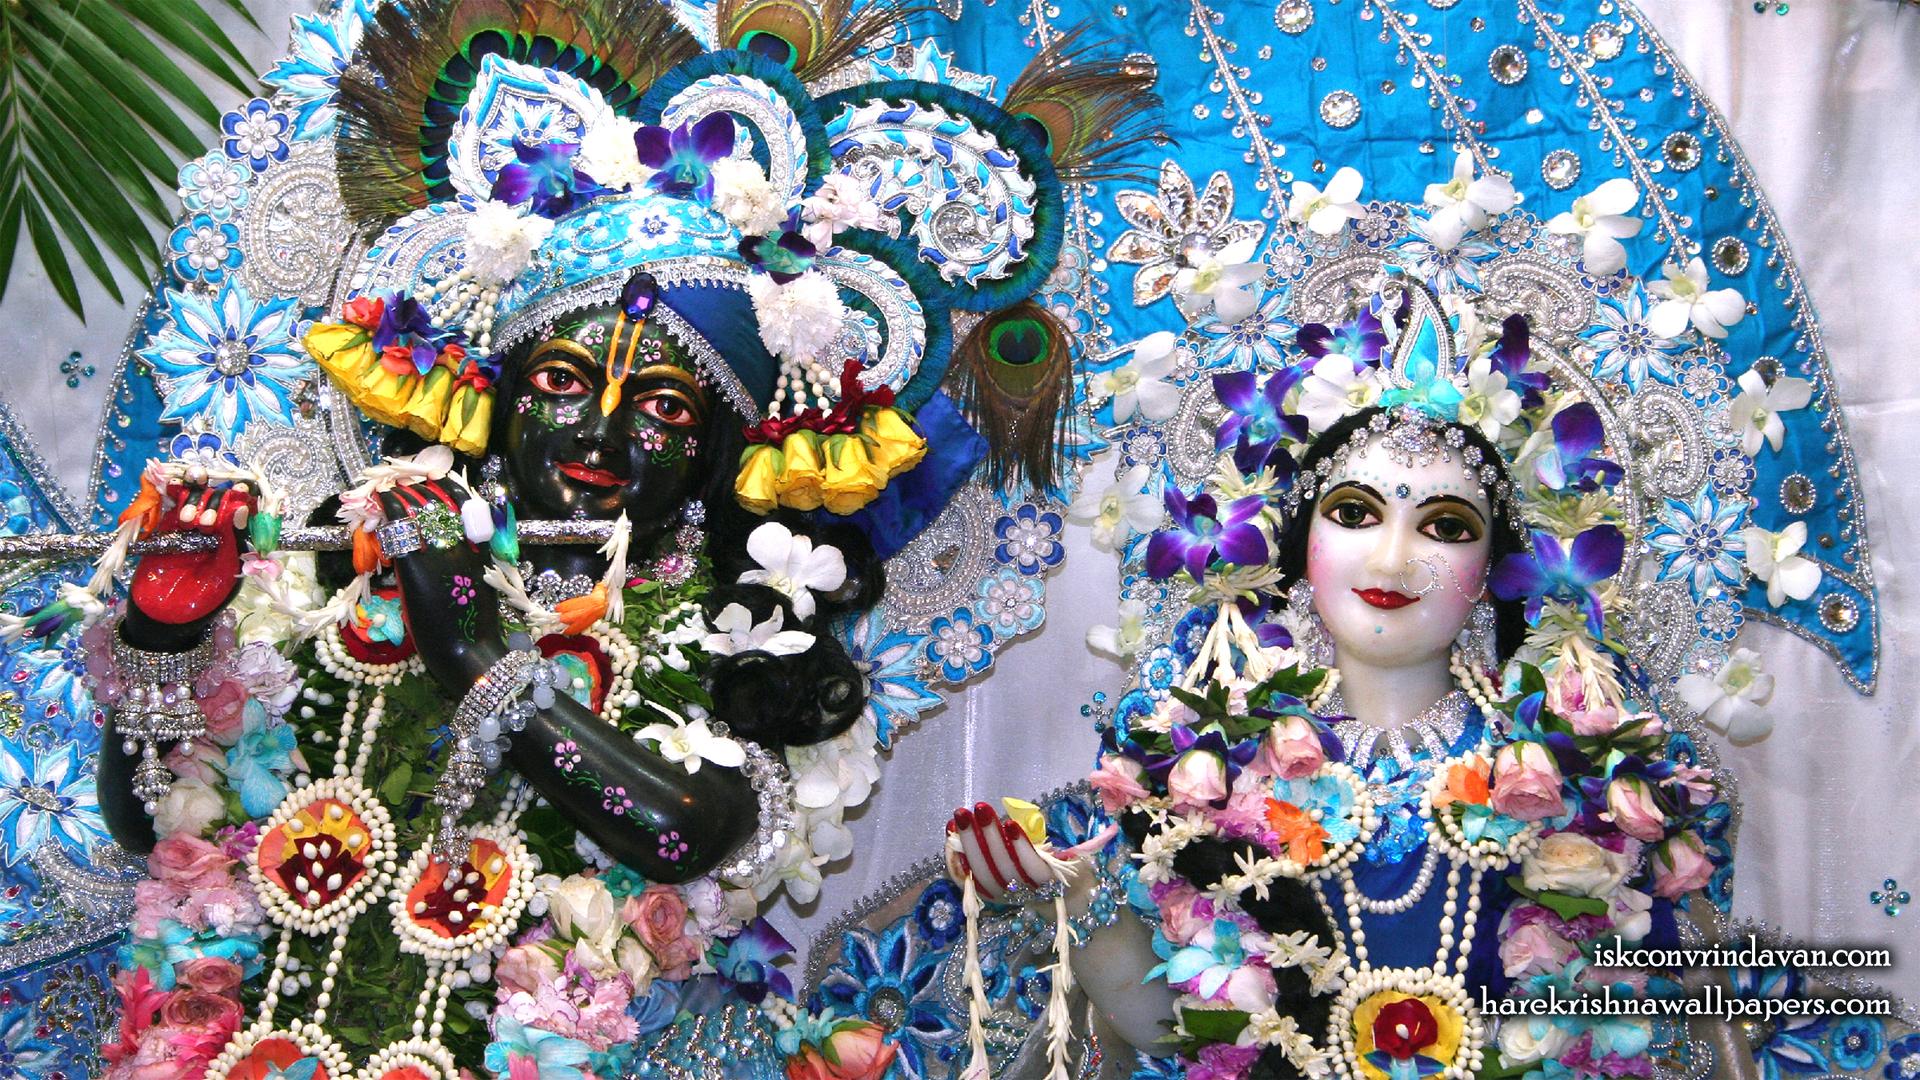 Sri Sri Radha Shyamsundar Close up Wallpaper (003) Size 1920x1080 Download